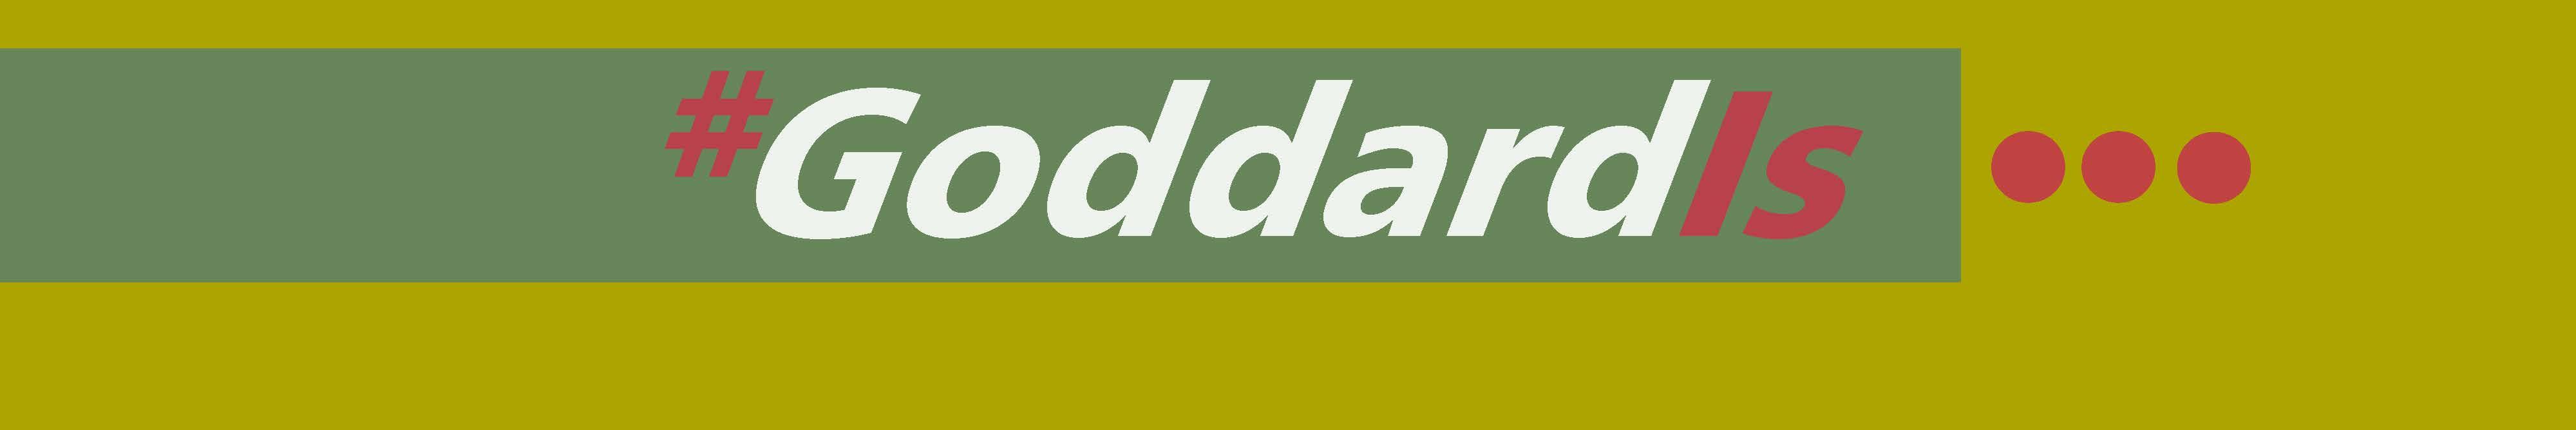 goddard college radio: